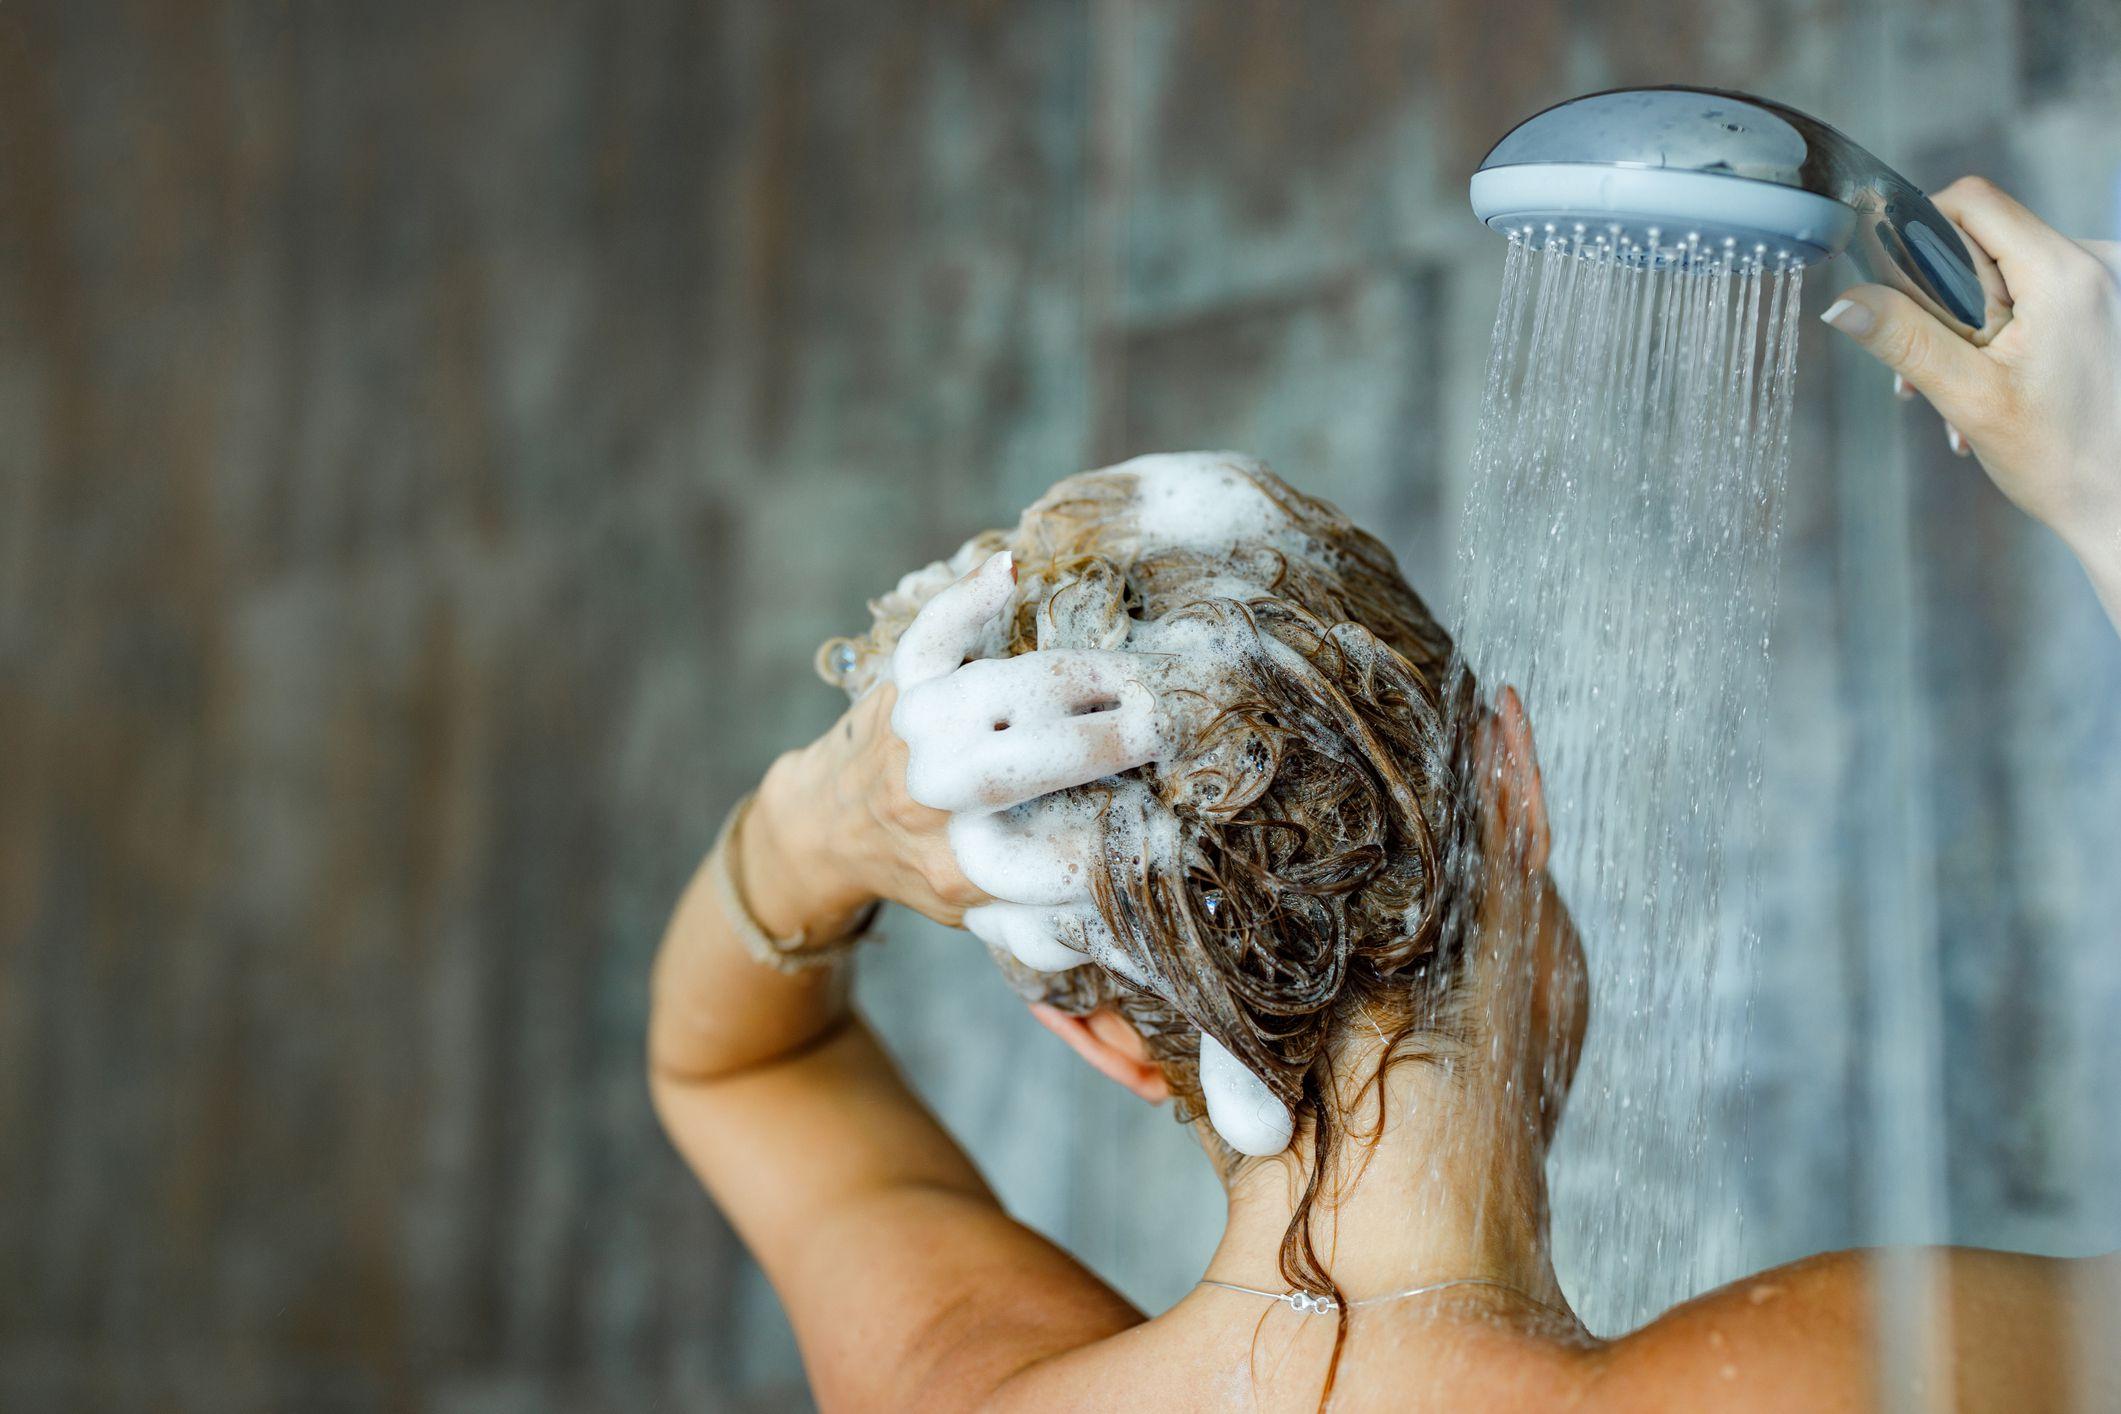 Natural Homemade Shampoo Recipes – How to Make Organic Hair Shampoo